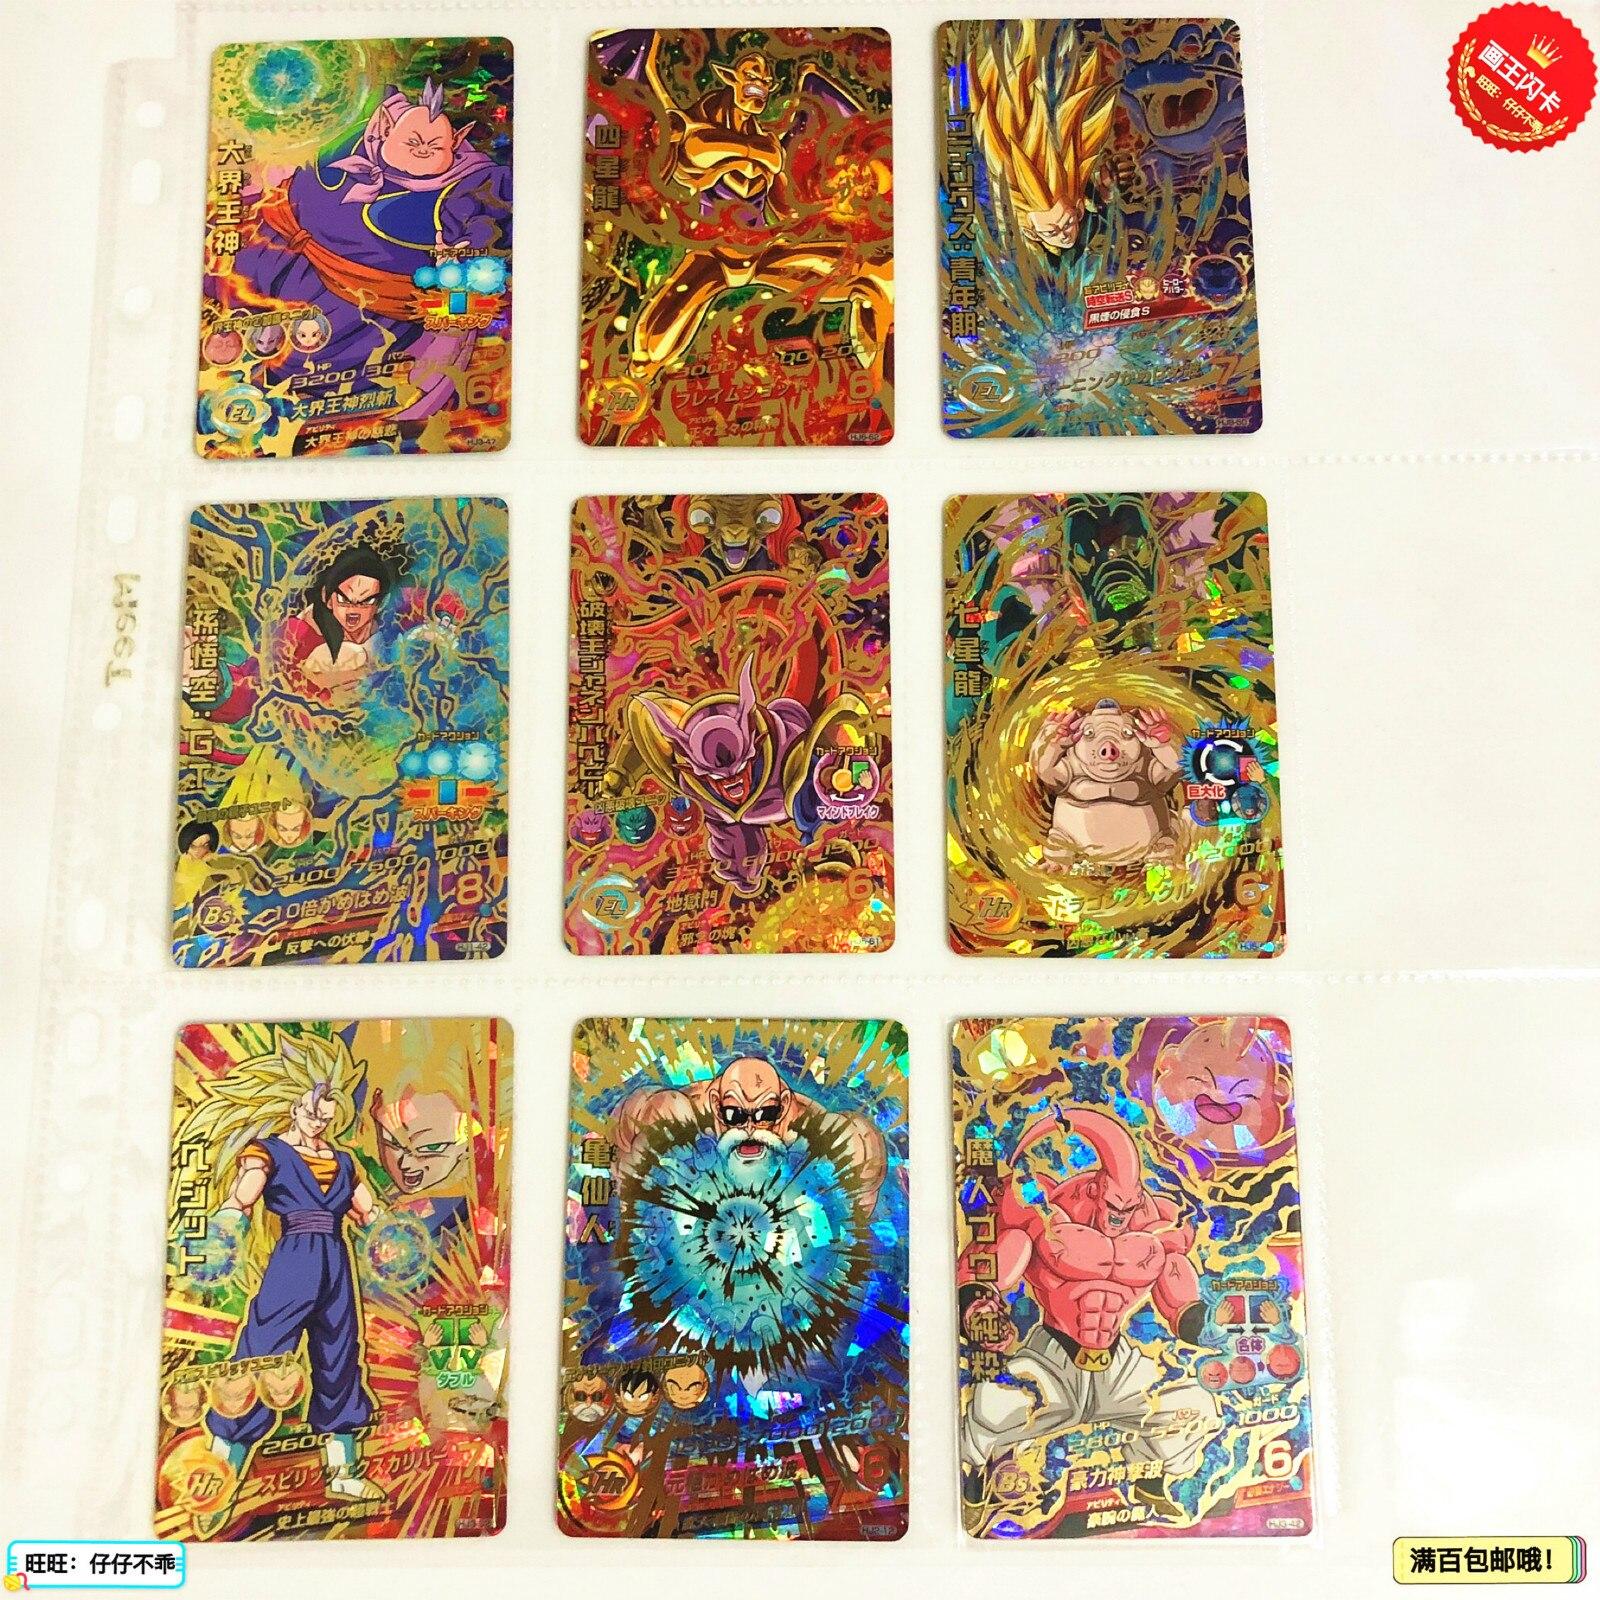 Japan Original Dragon Ball Hero Card SEC 4 Stars UR HJ Goku Toys Hobbies Collectibles Game Collection Anime Cards